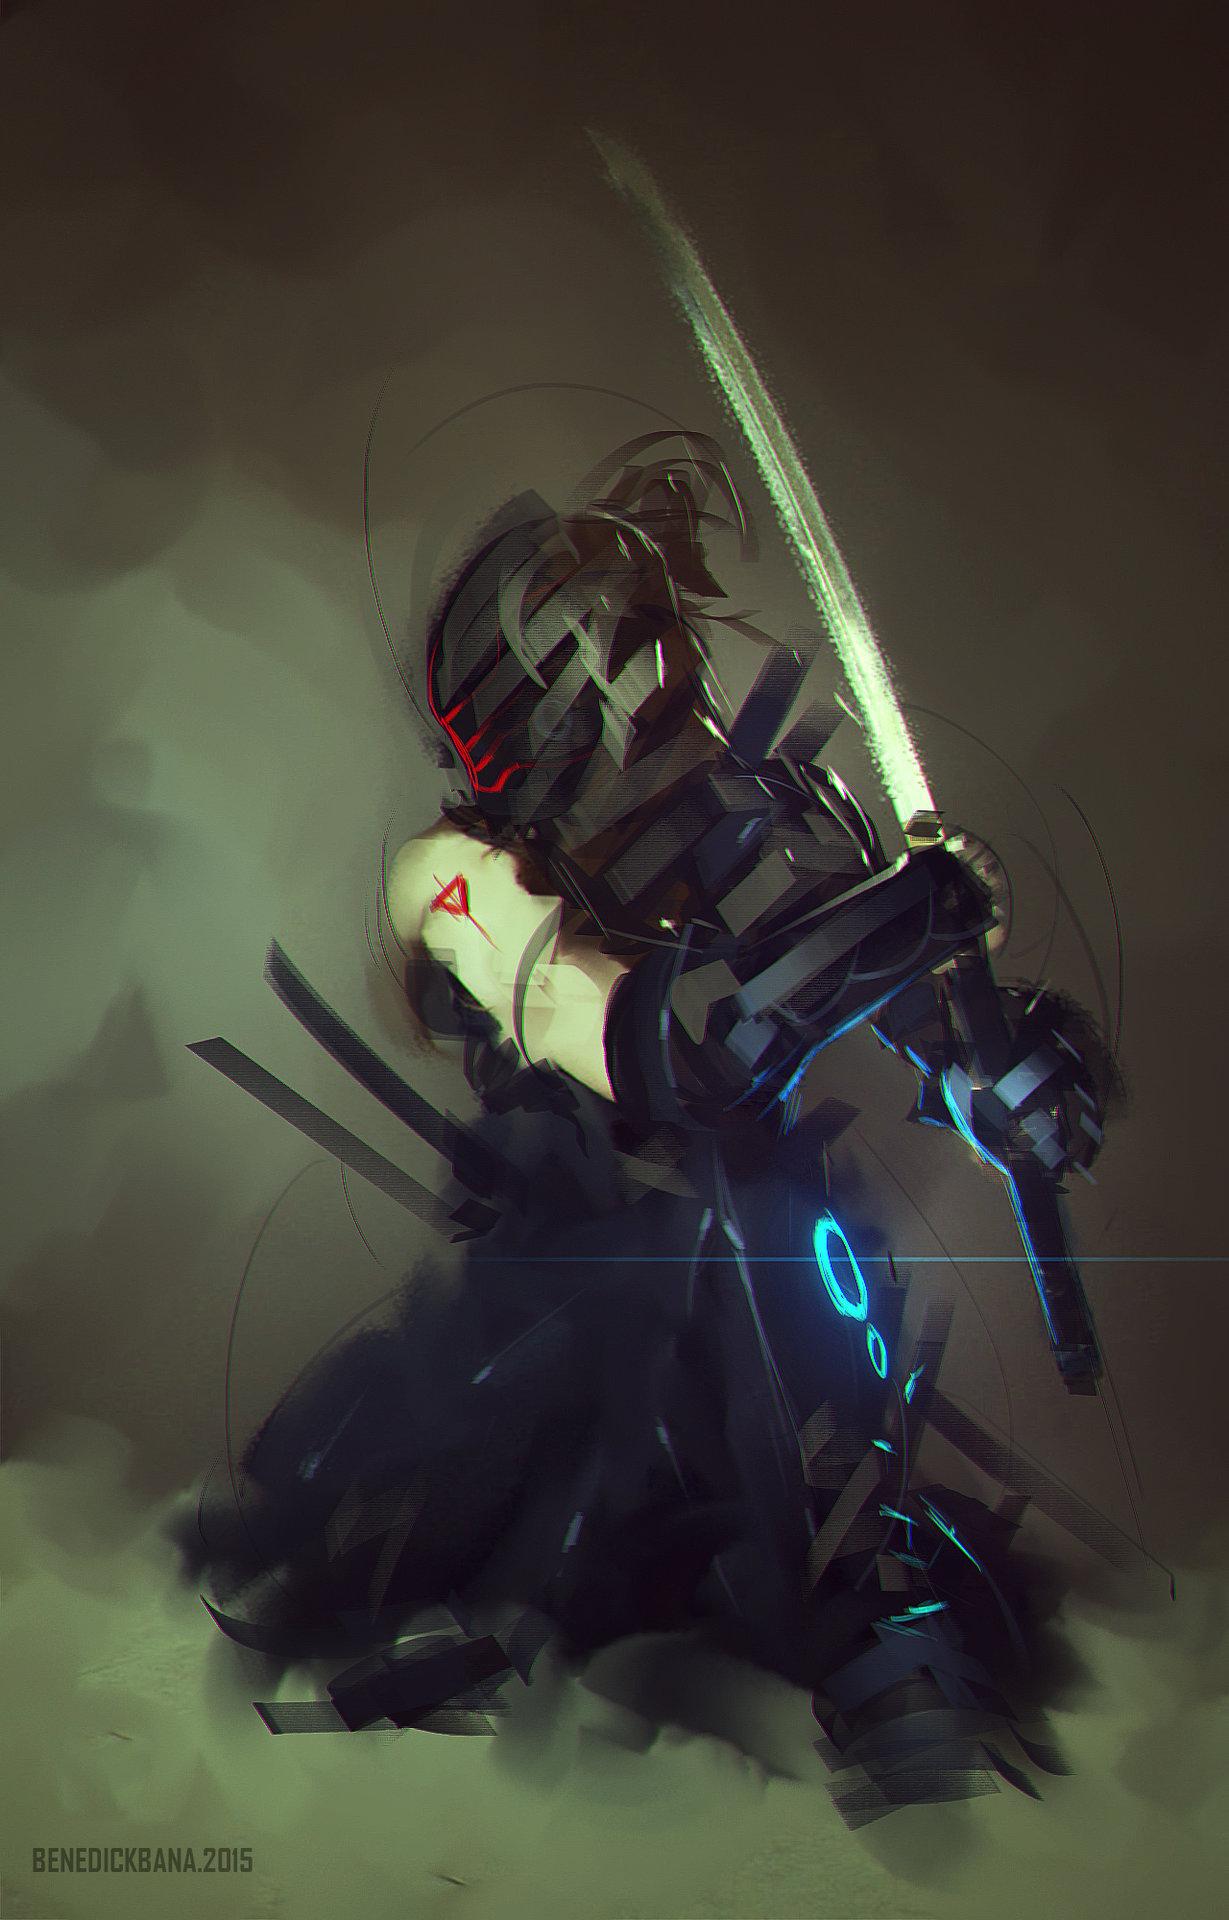 Benedick bana robot ninja